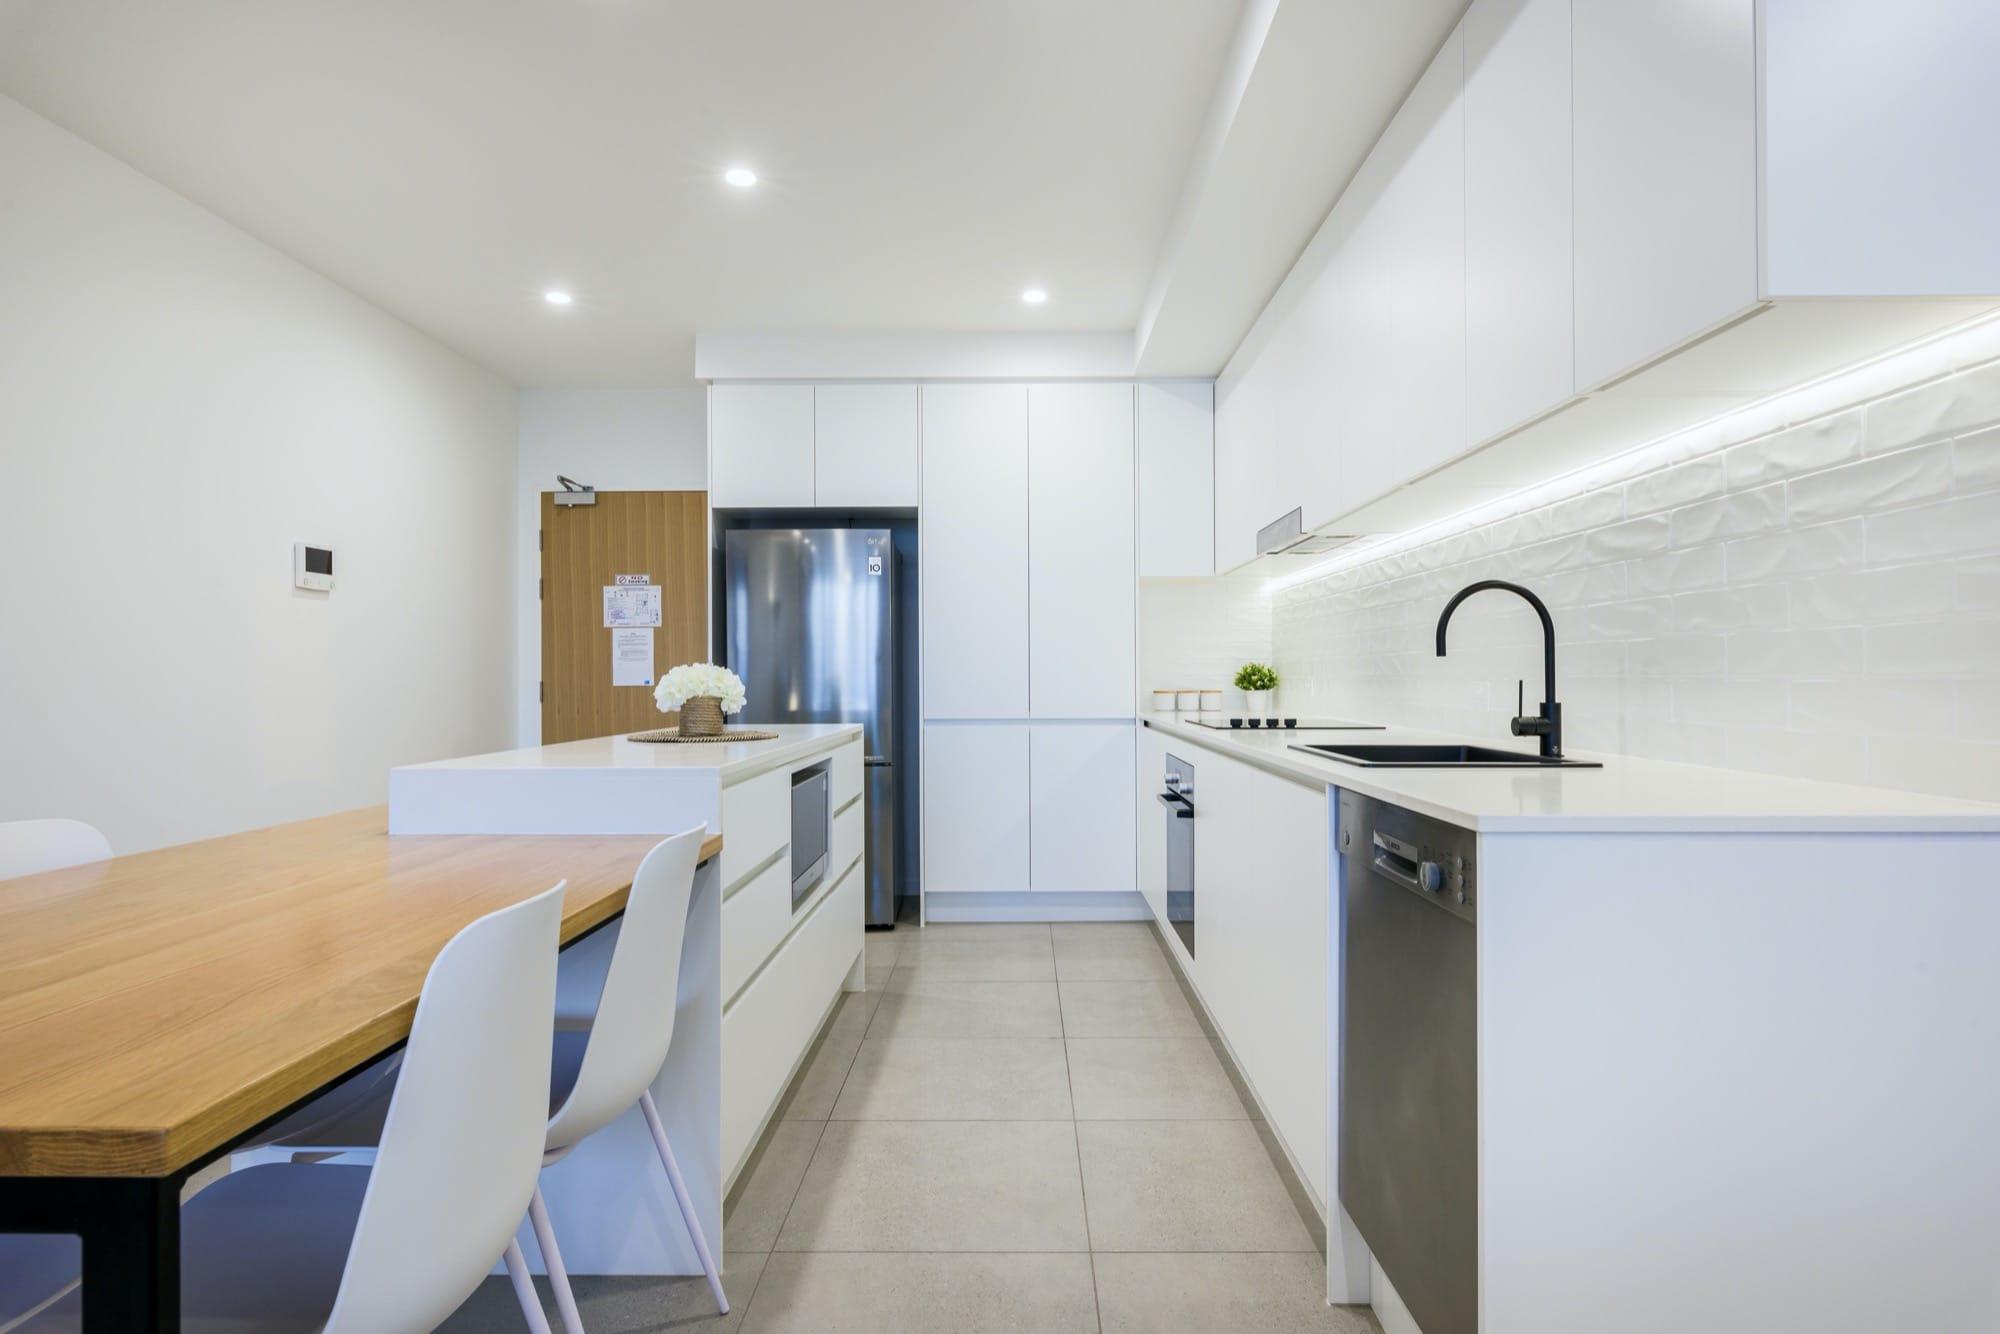 unit-501-kitchen-2